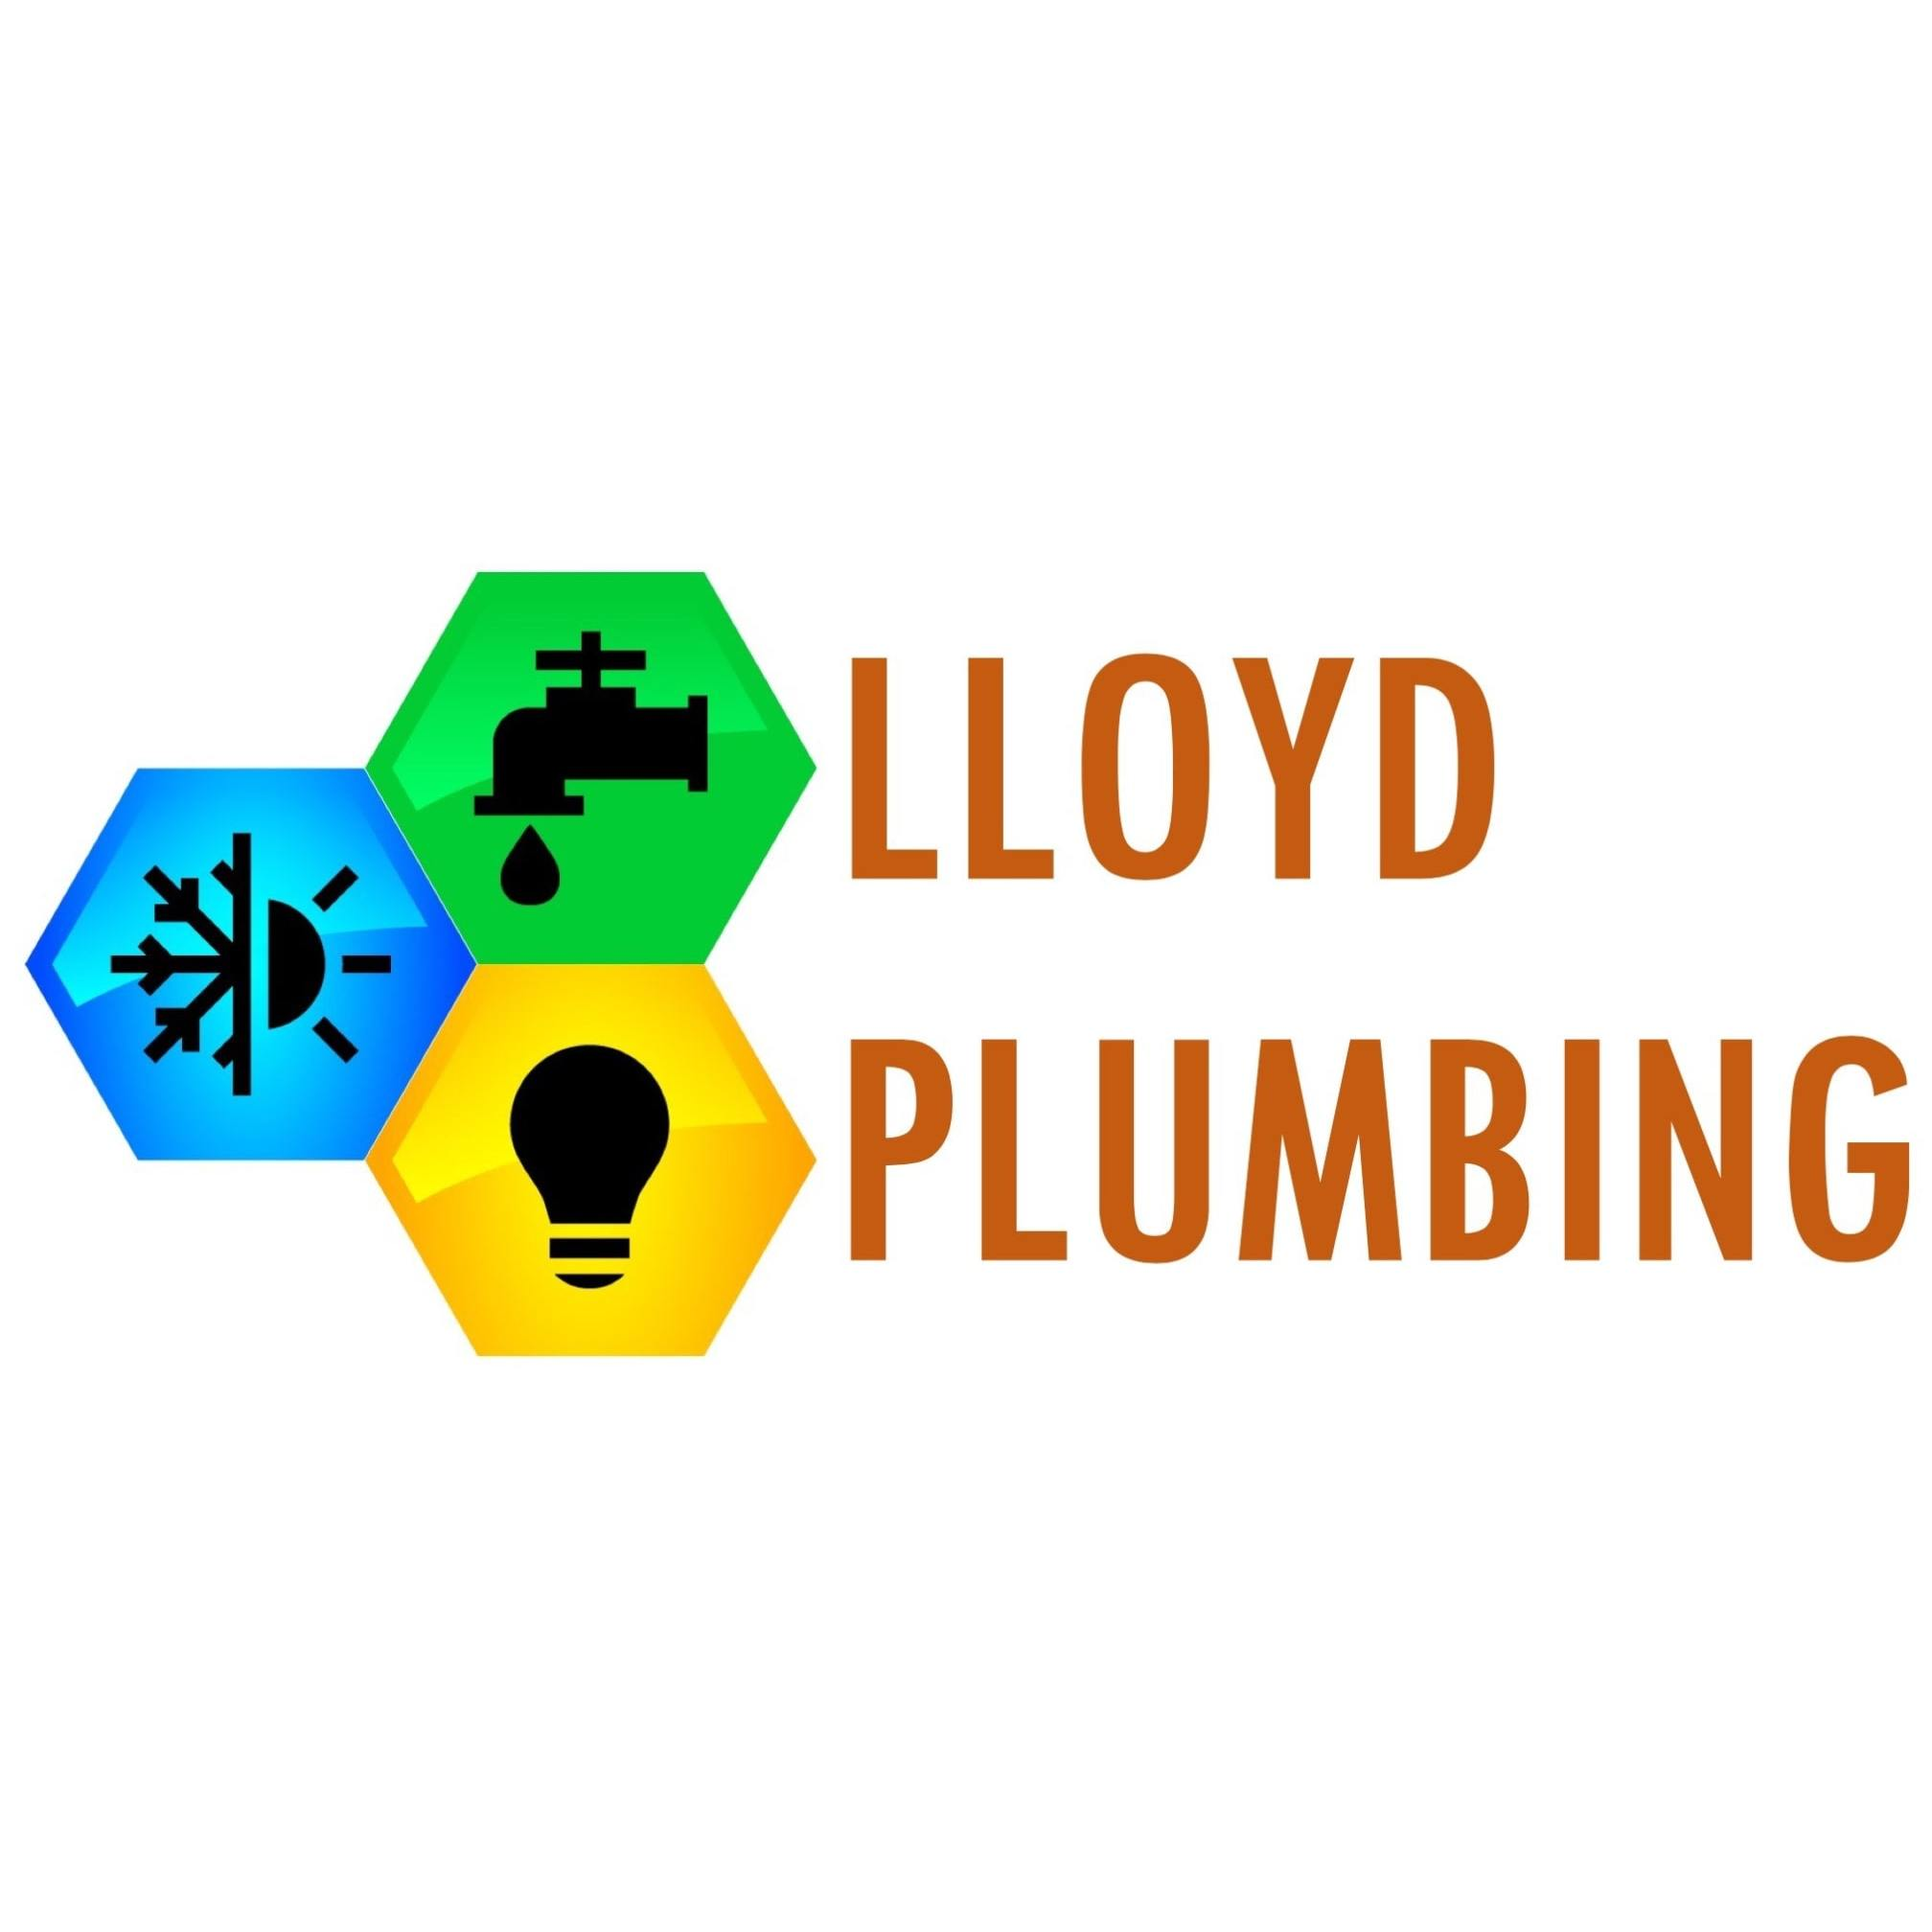 Lloyd Plumbing - Stockport, Lancashire SK6 1PF - 07402 196376 | ShowMeLocal.com